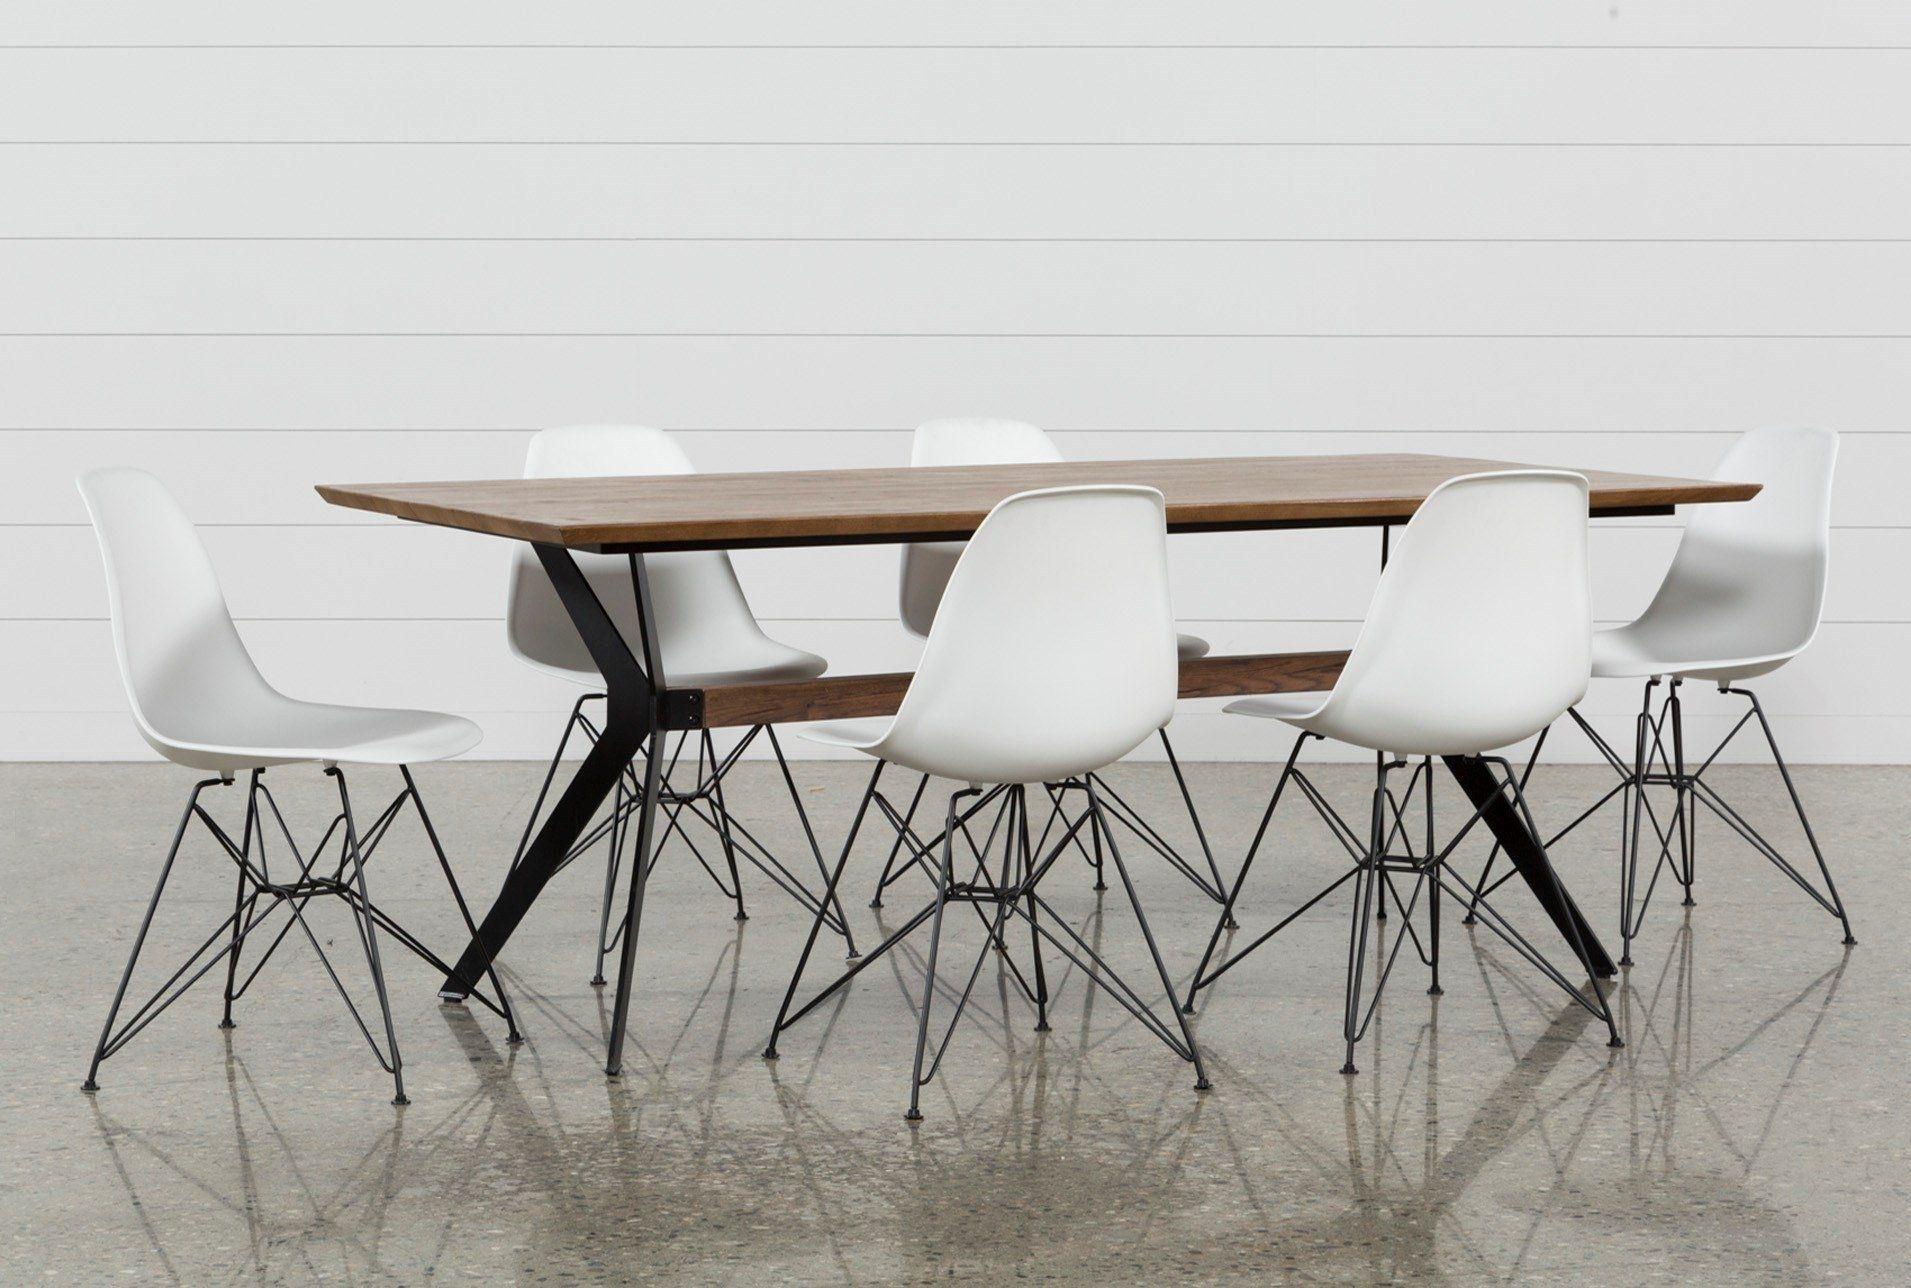 Popular Photo of Alexa White Side Chairs